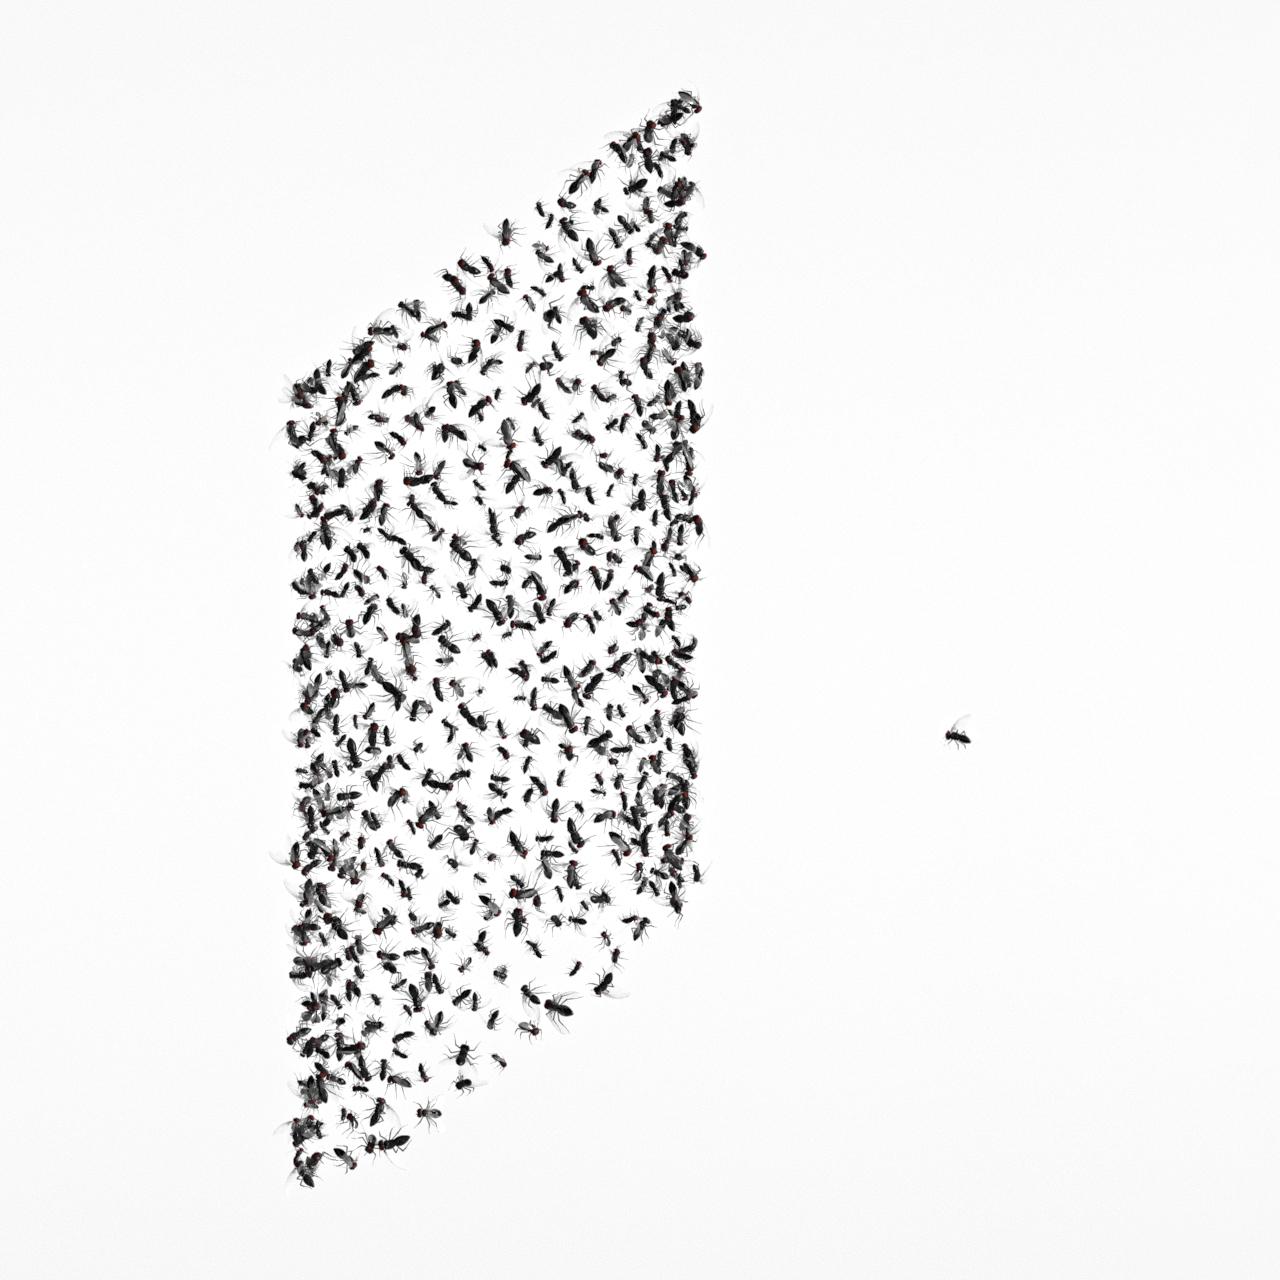 Flys_01.jpg